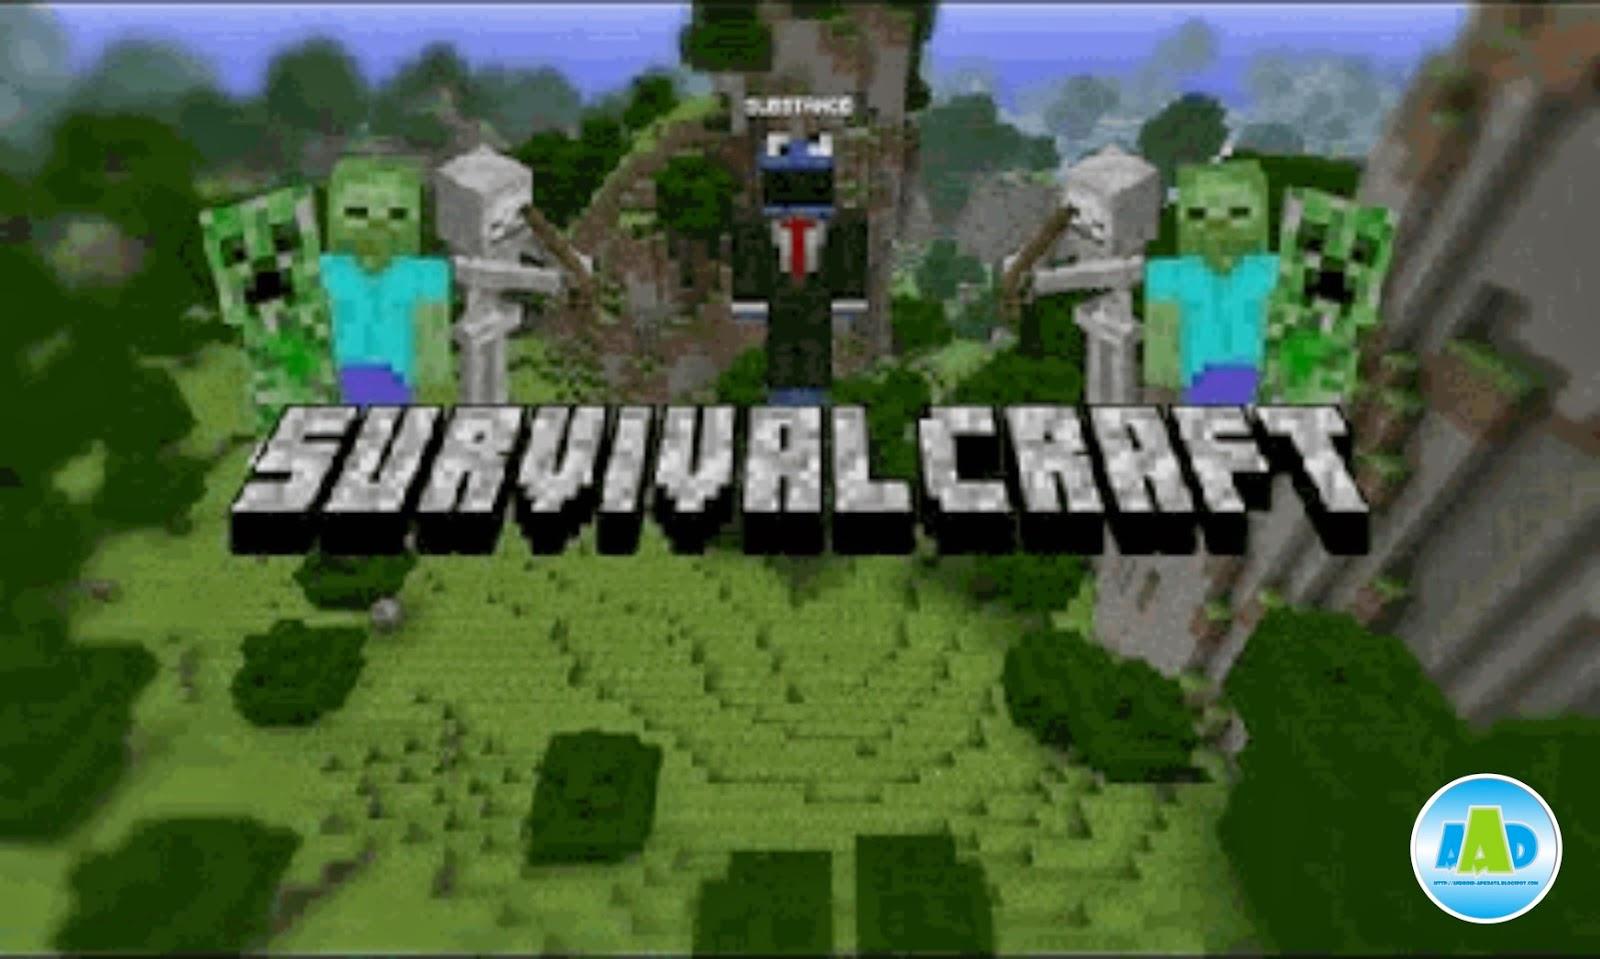 Survivalcraft 2 2.1.14.0 Mod APK Download